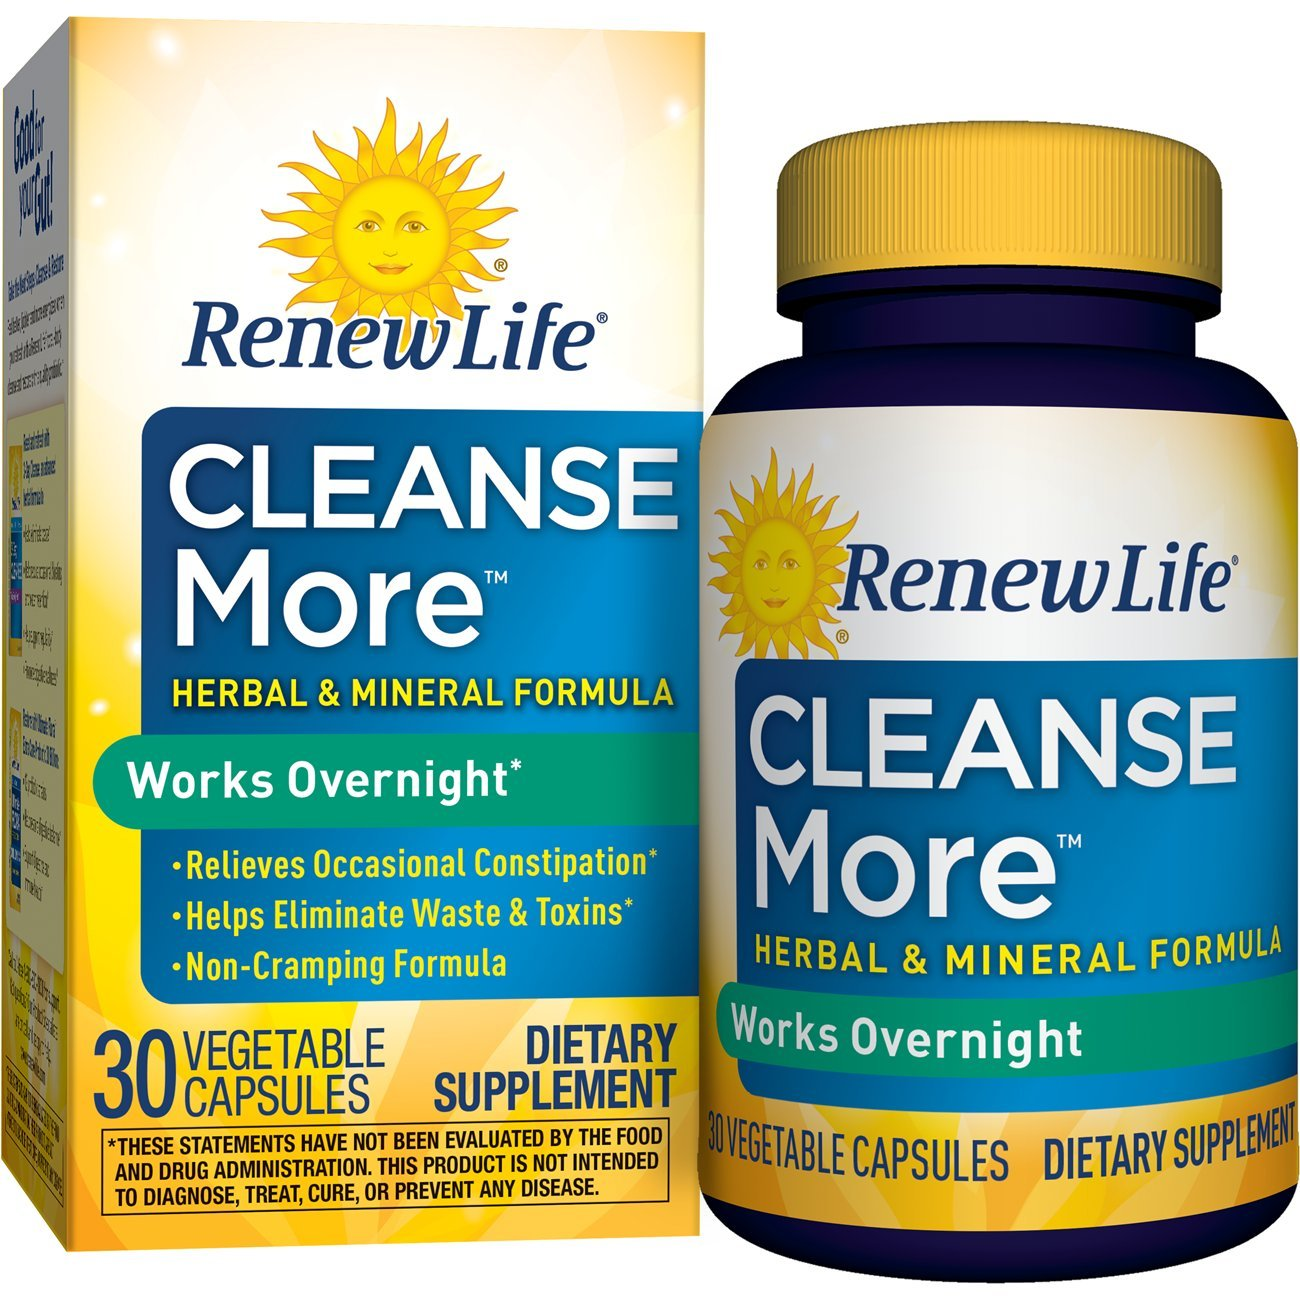 Renew Life constipation supplement vegetable